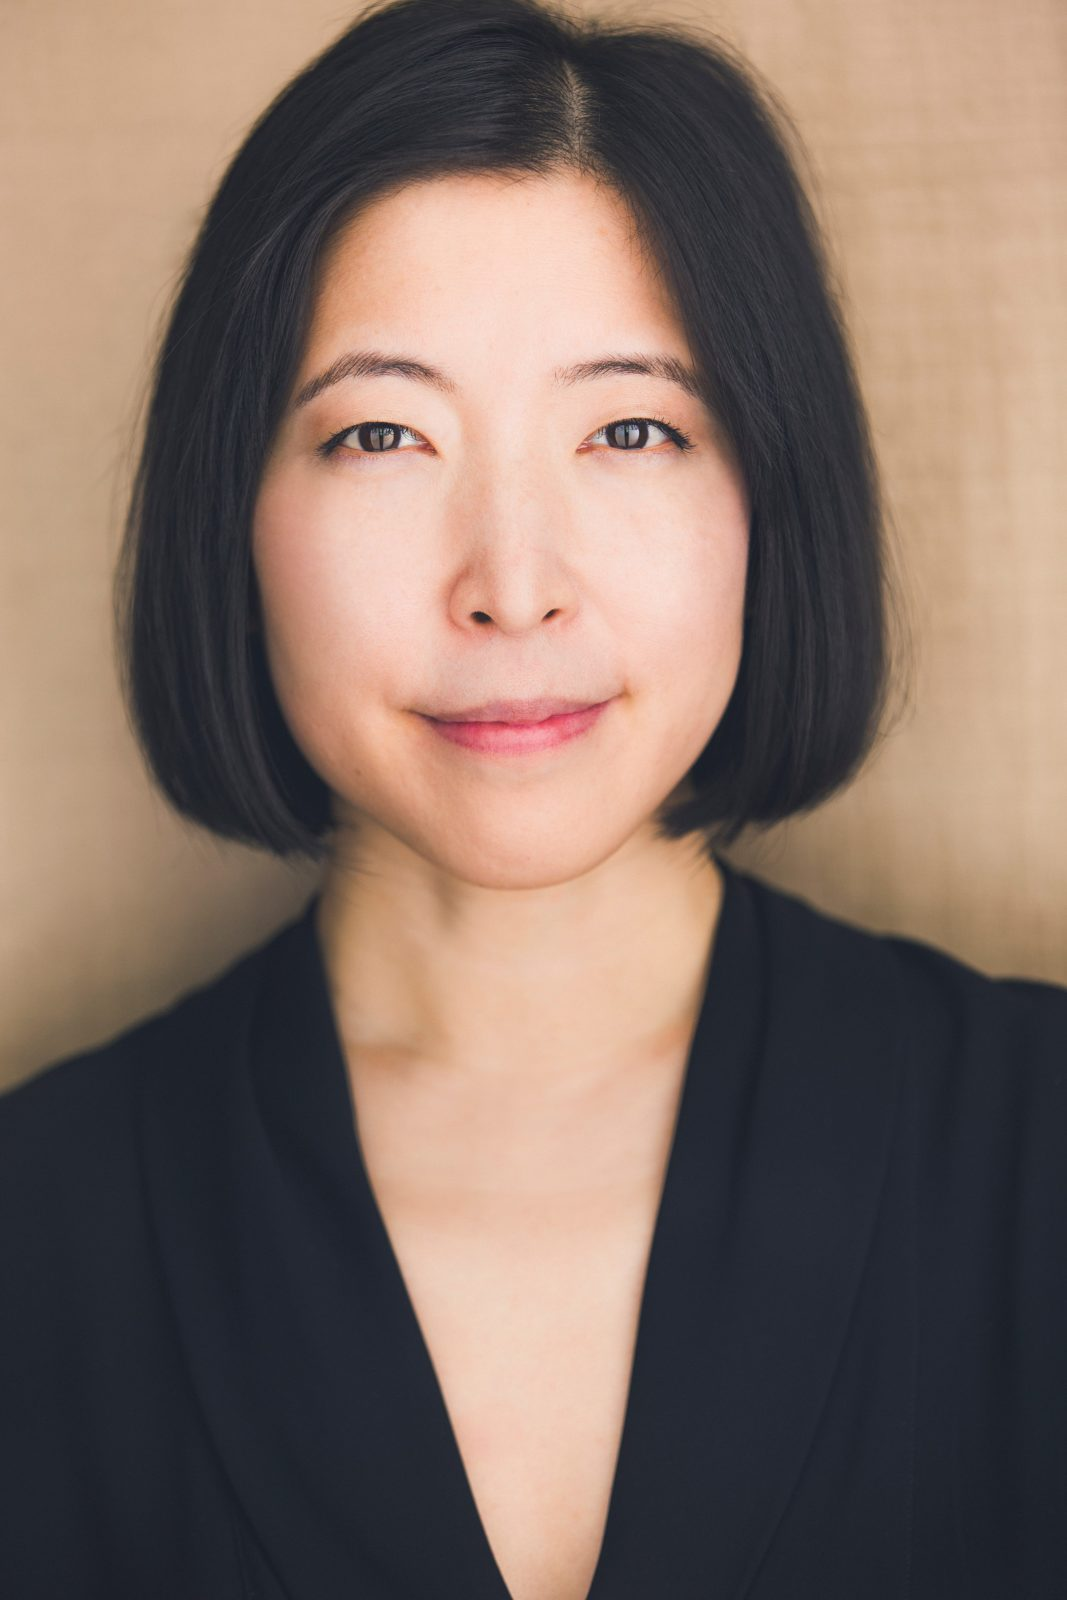 Catherine Chung. Photo Cred: David Noles